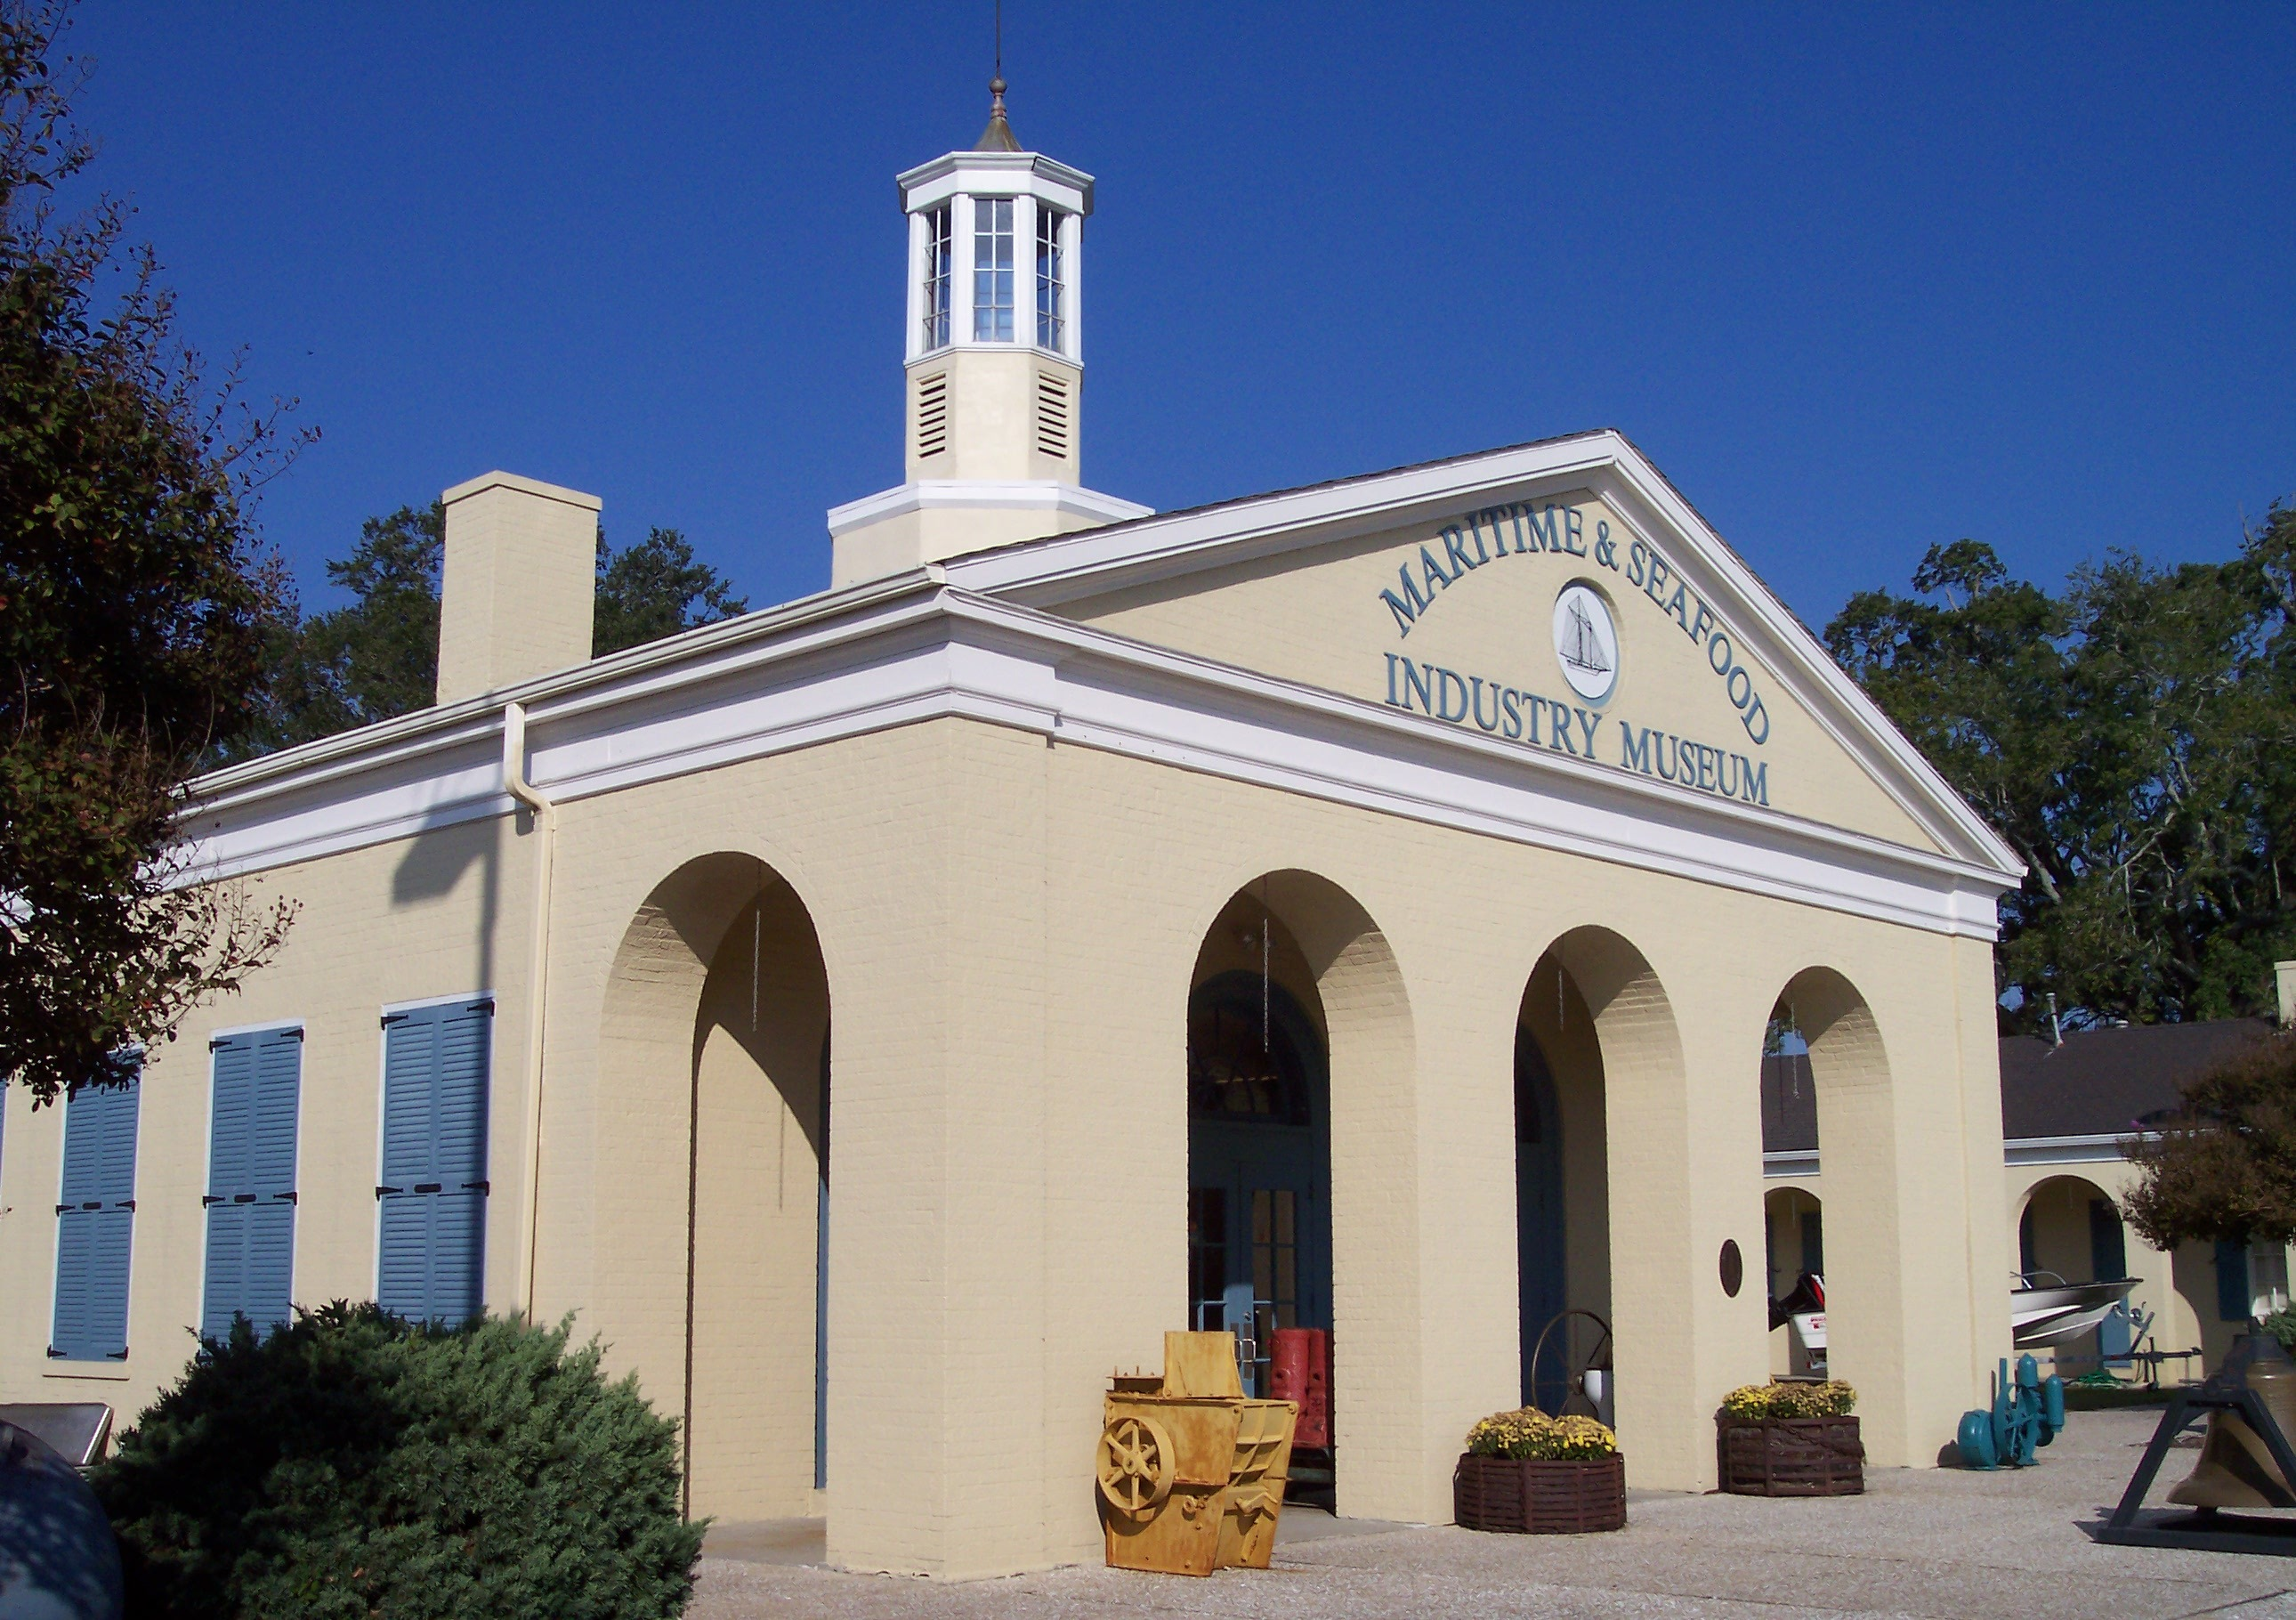 Maritime & Seafood Museum